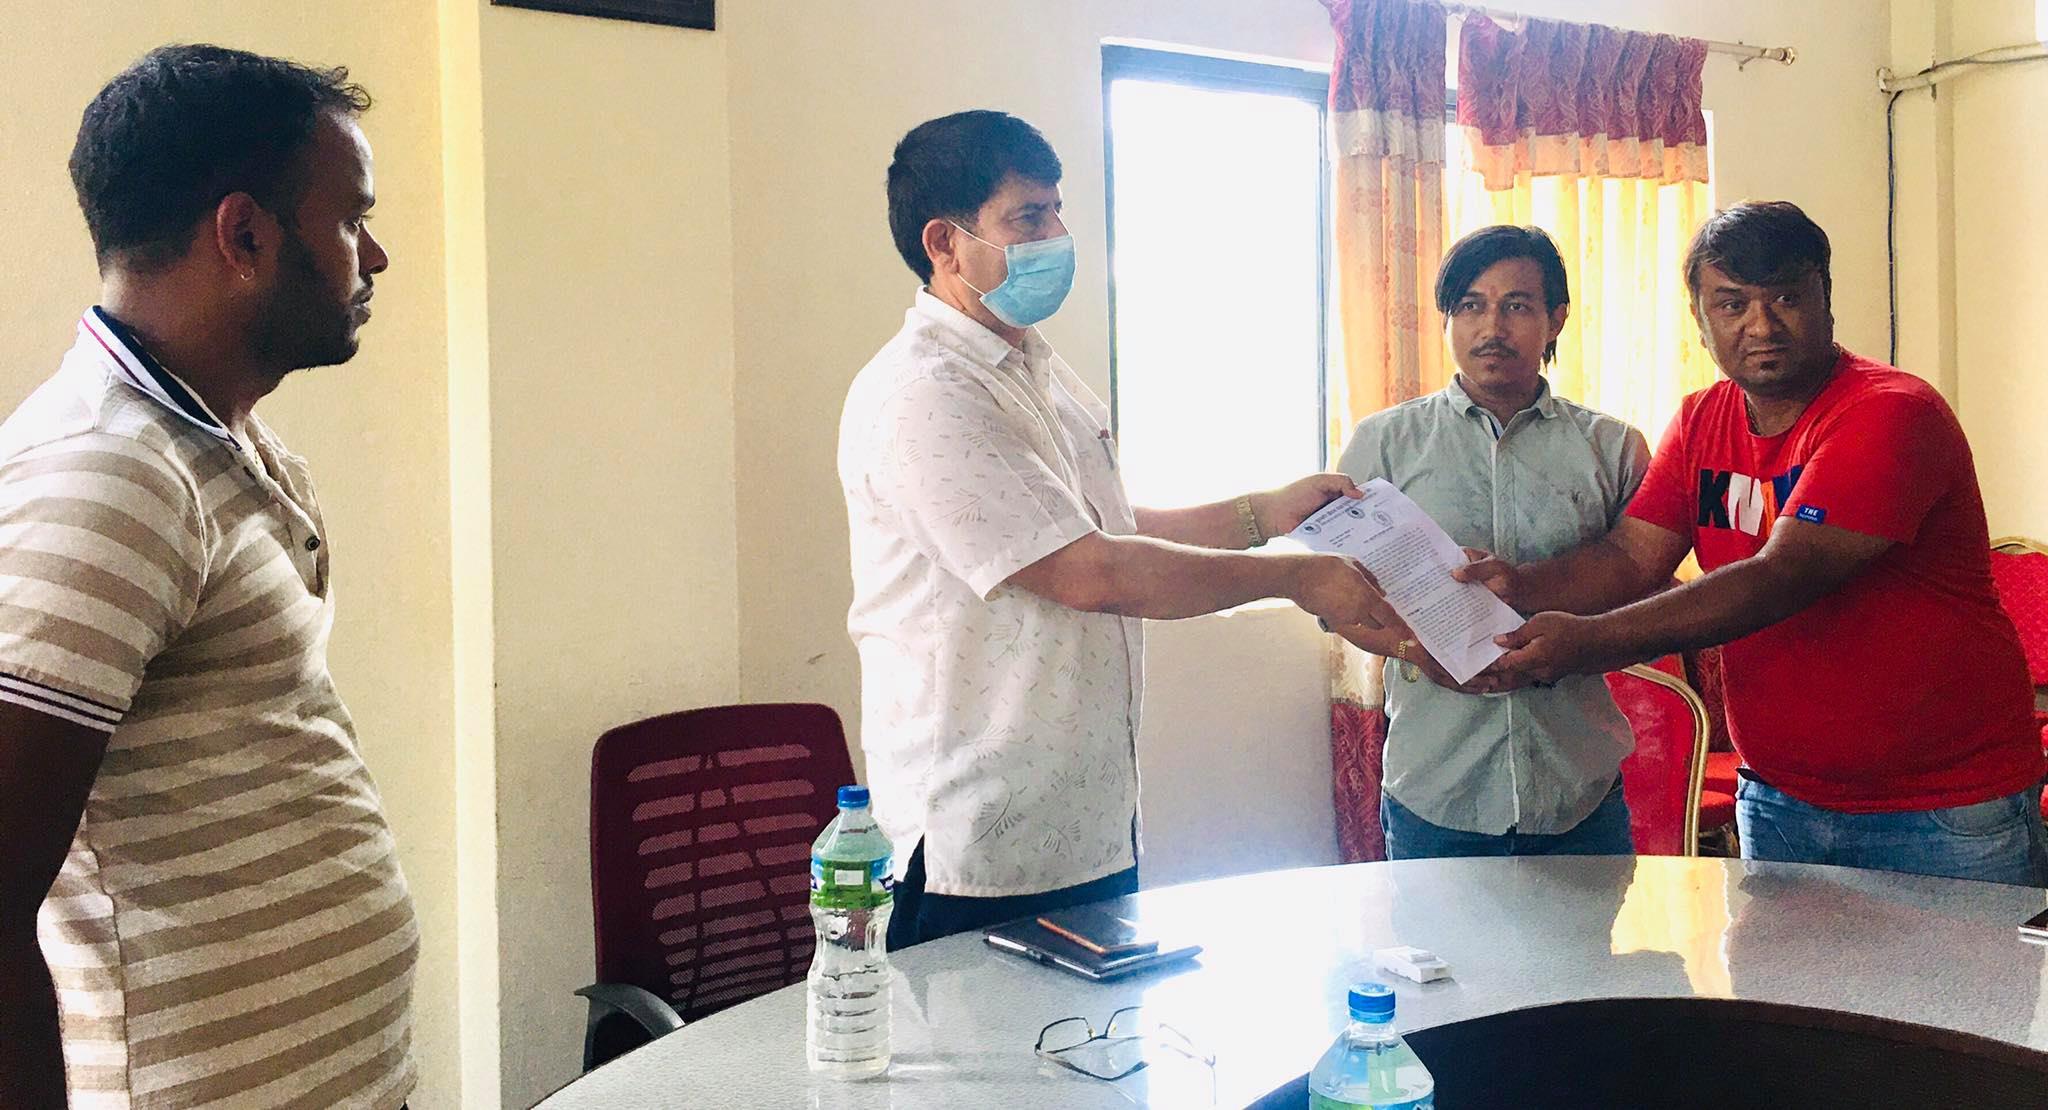 nuwakot hotel and restaurant enterprenure requested to cdo in lockdown